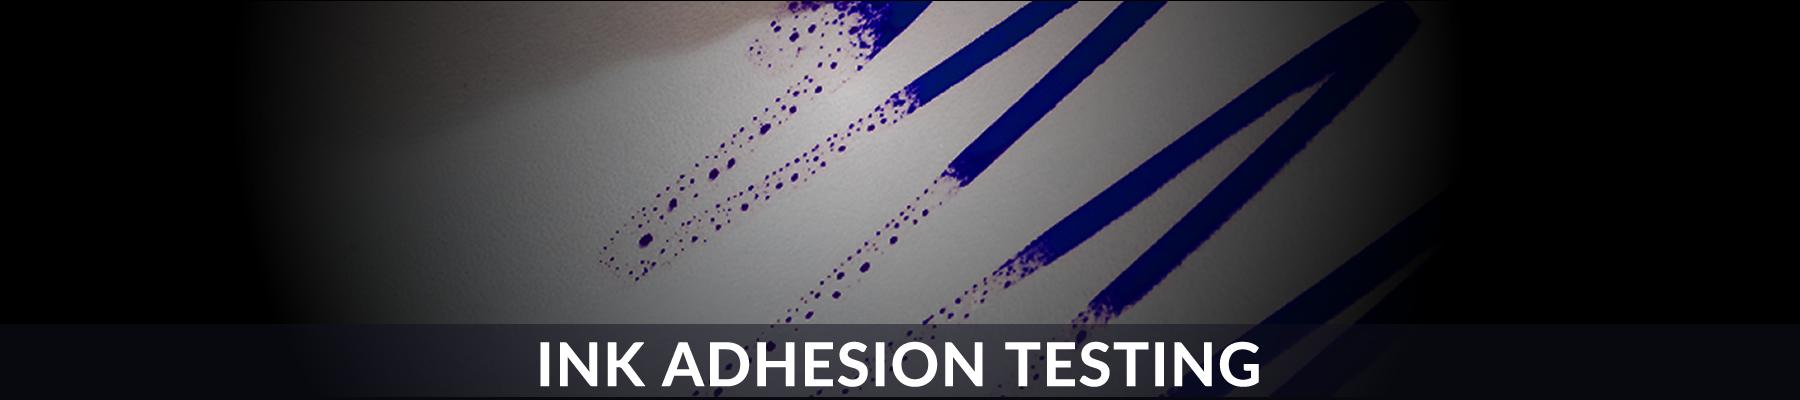 Ink Adhesion Testing 1